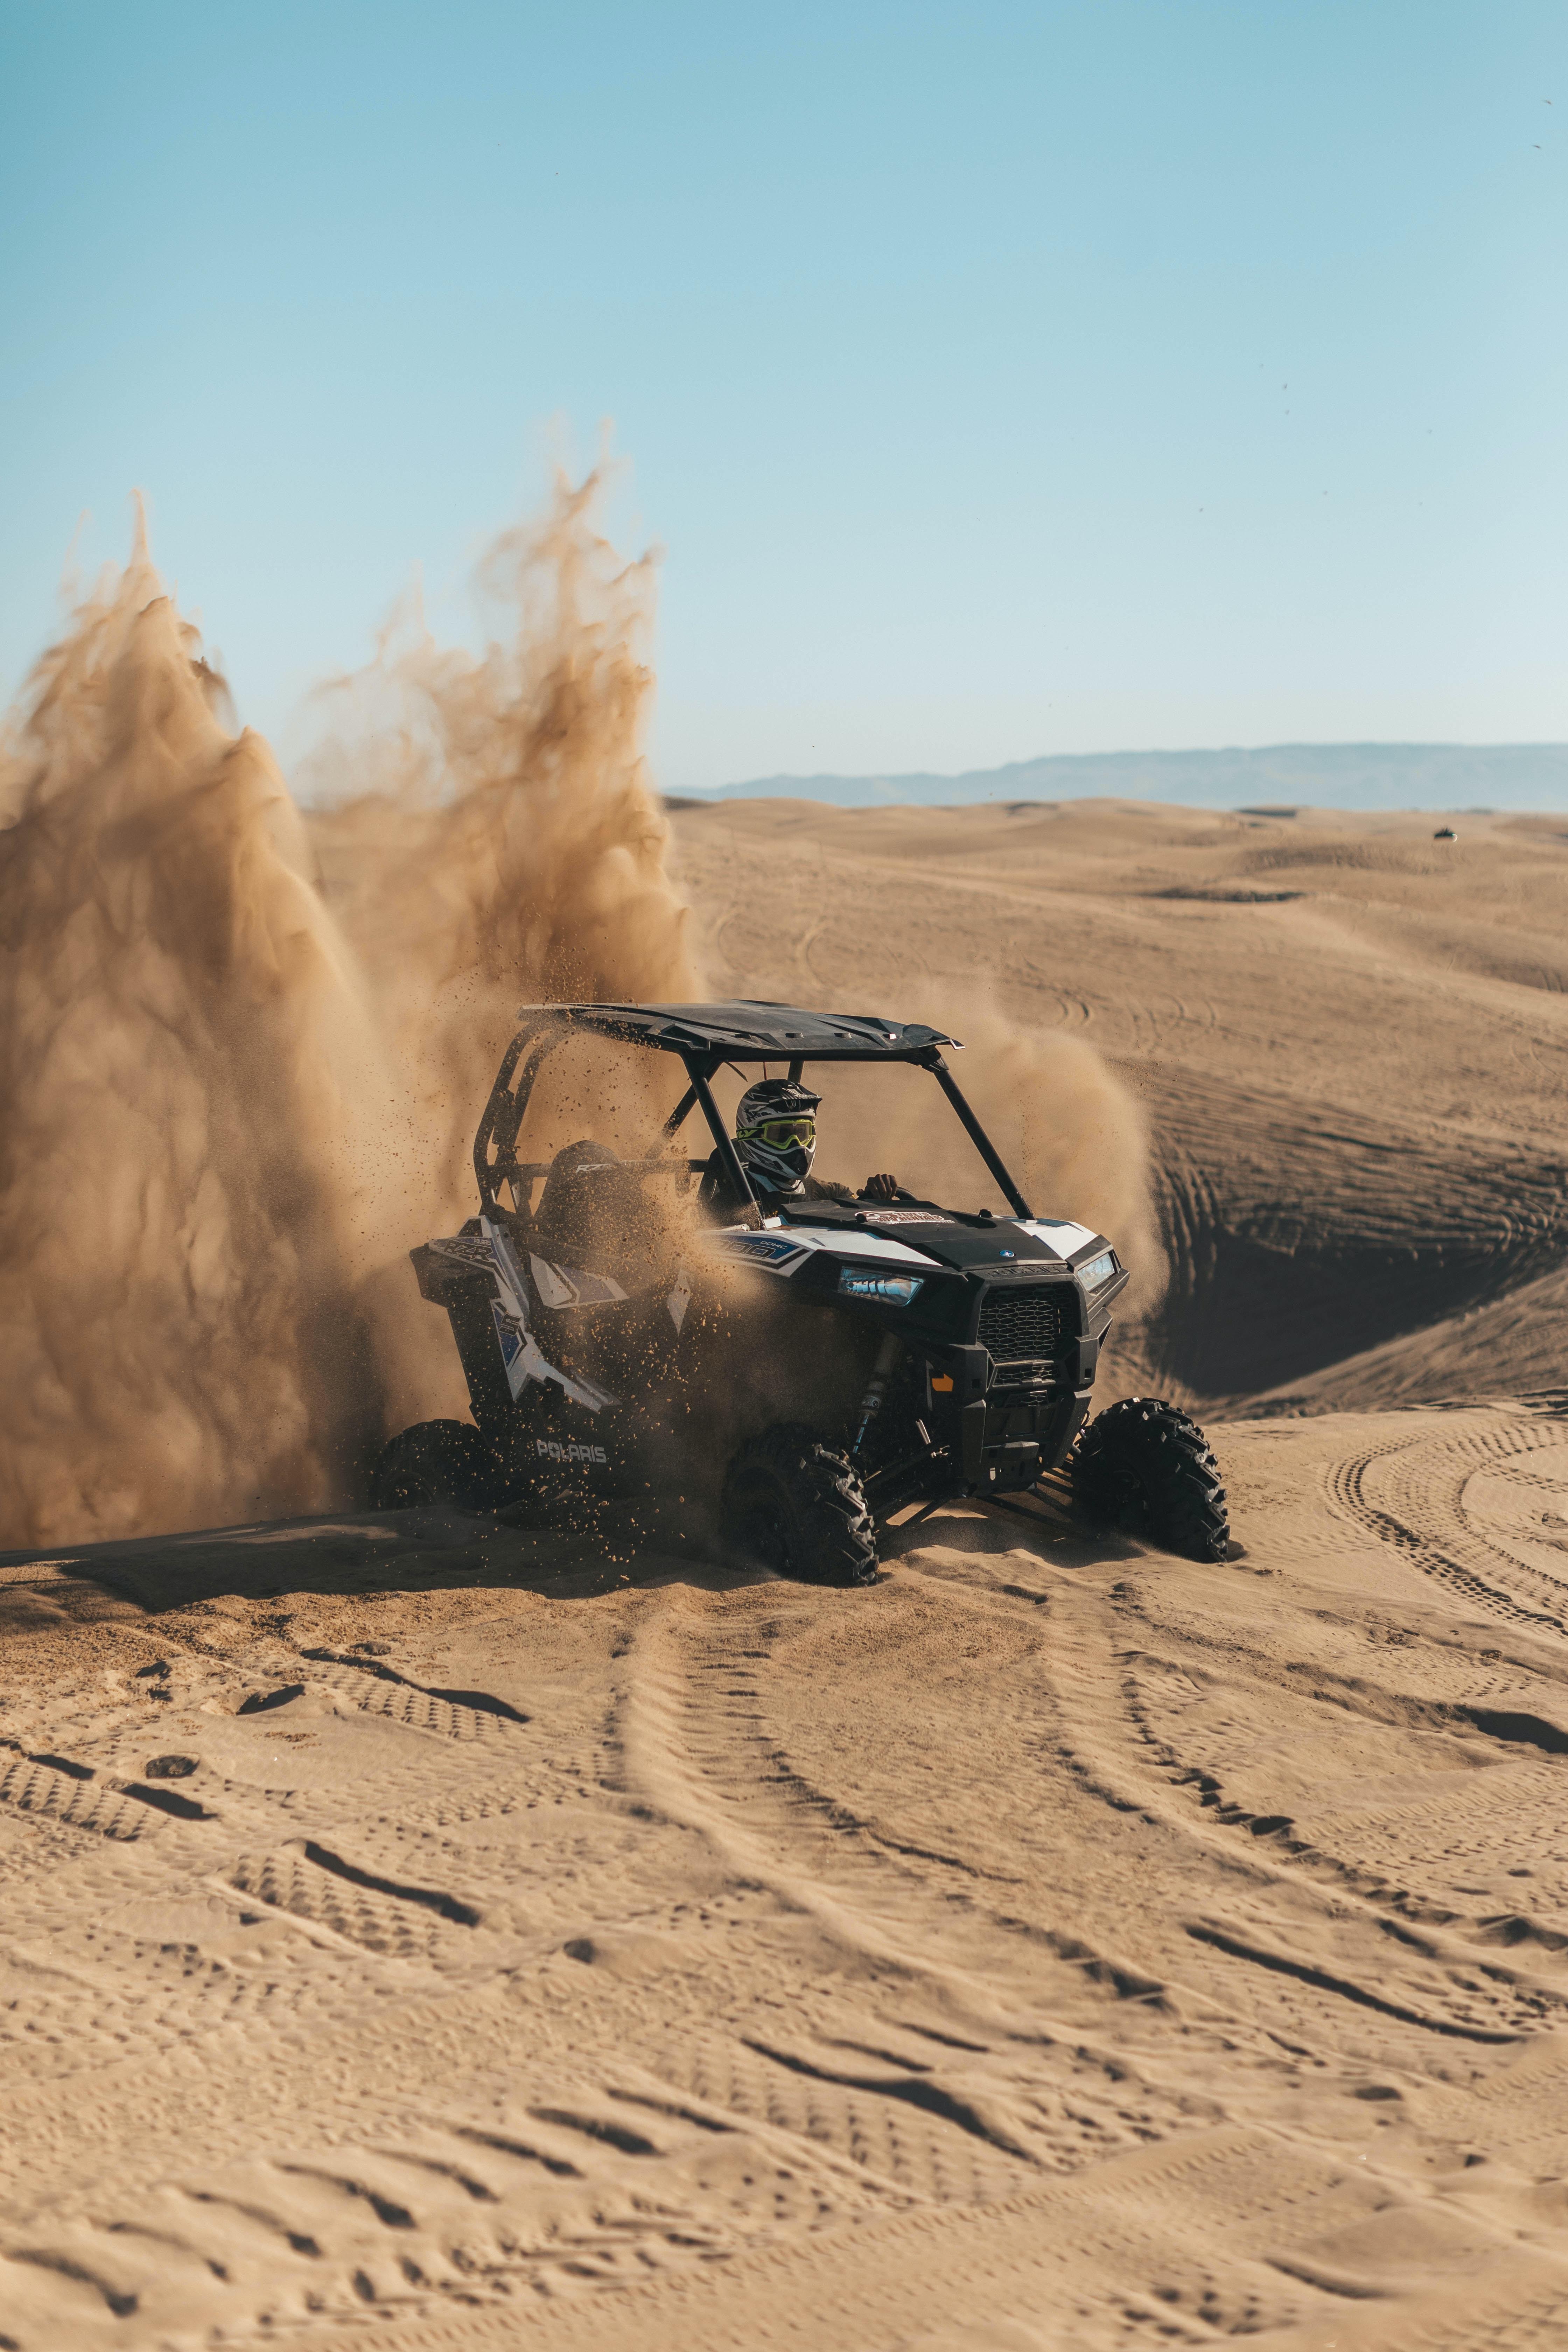 person riding an UTV on desert